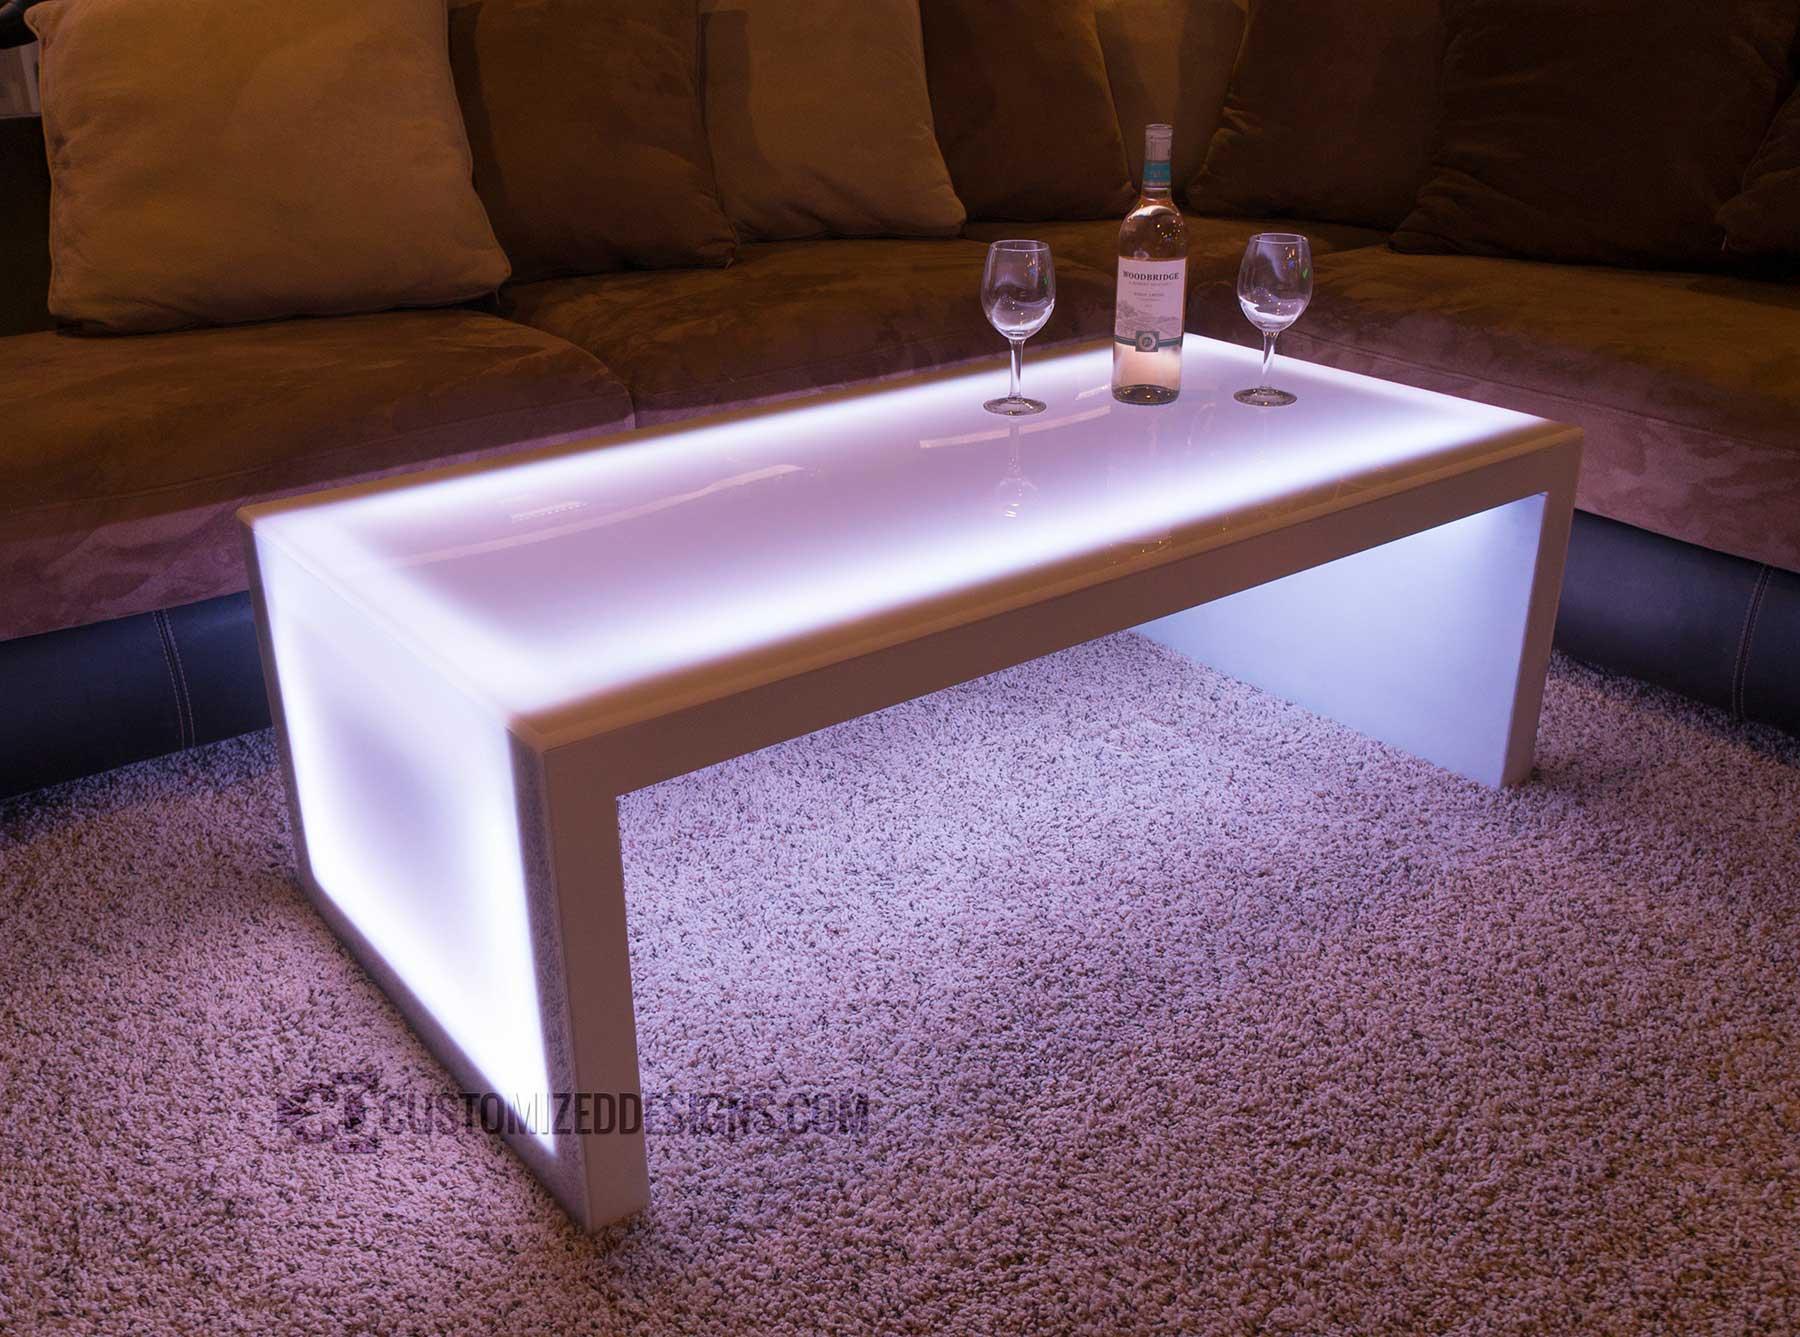 Carbon Series Led Coffee Table 2 Customizeddesigns Com